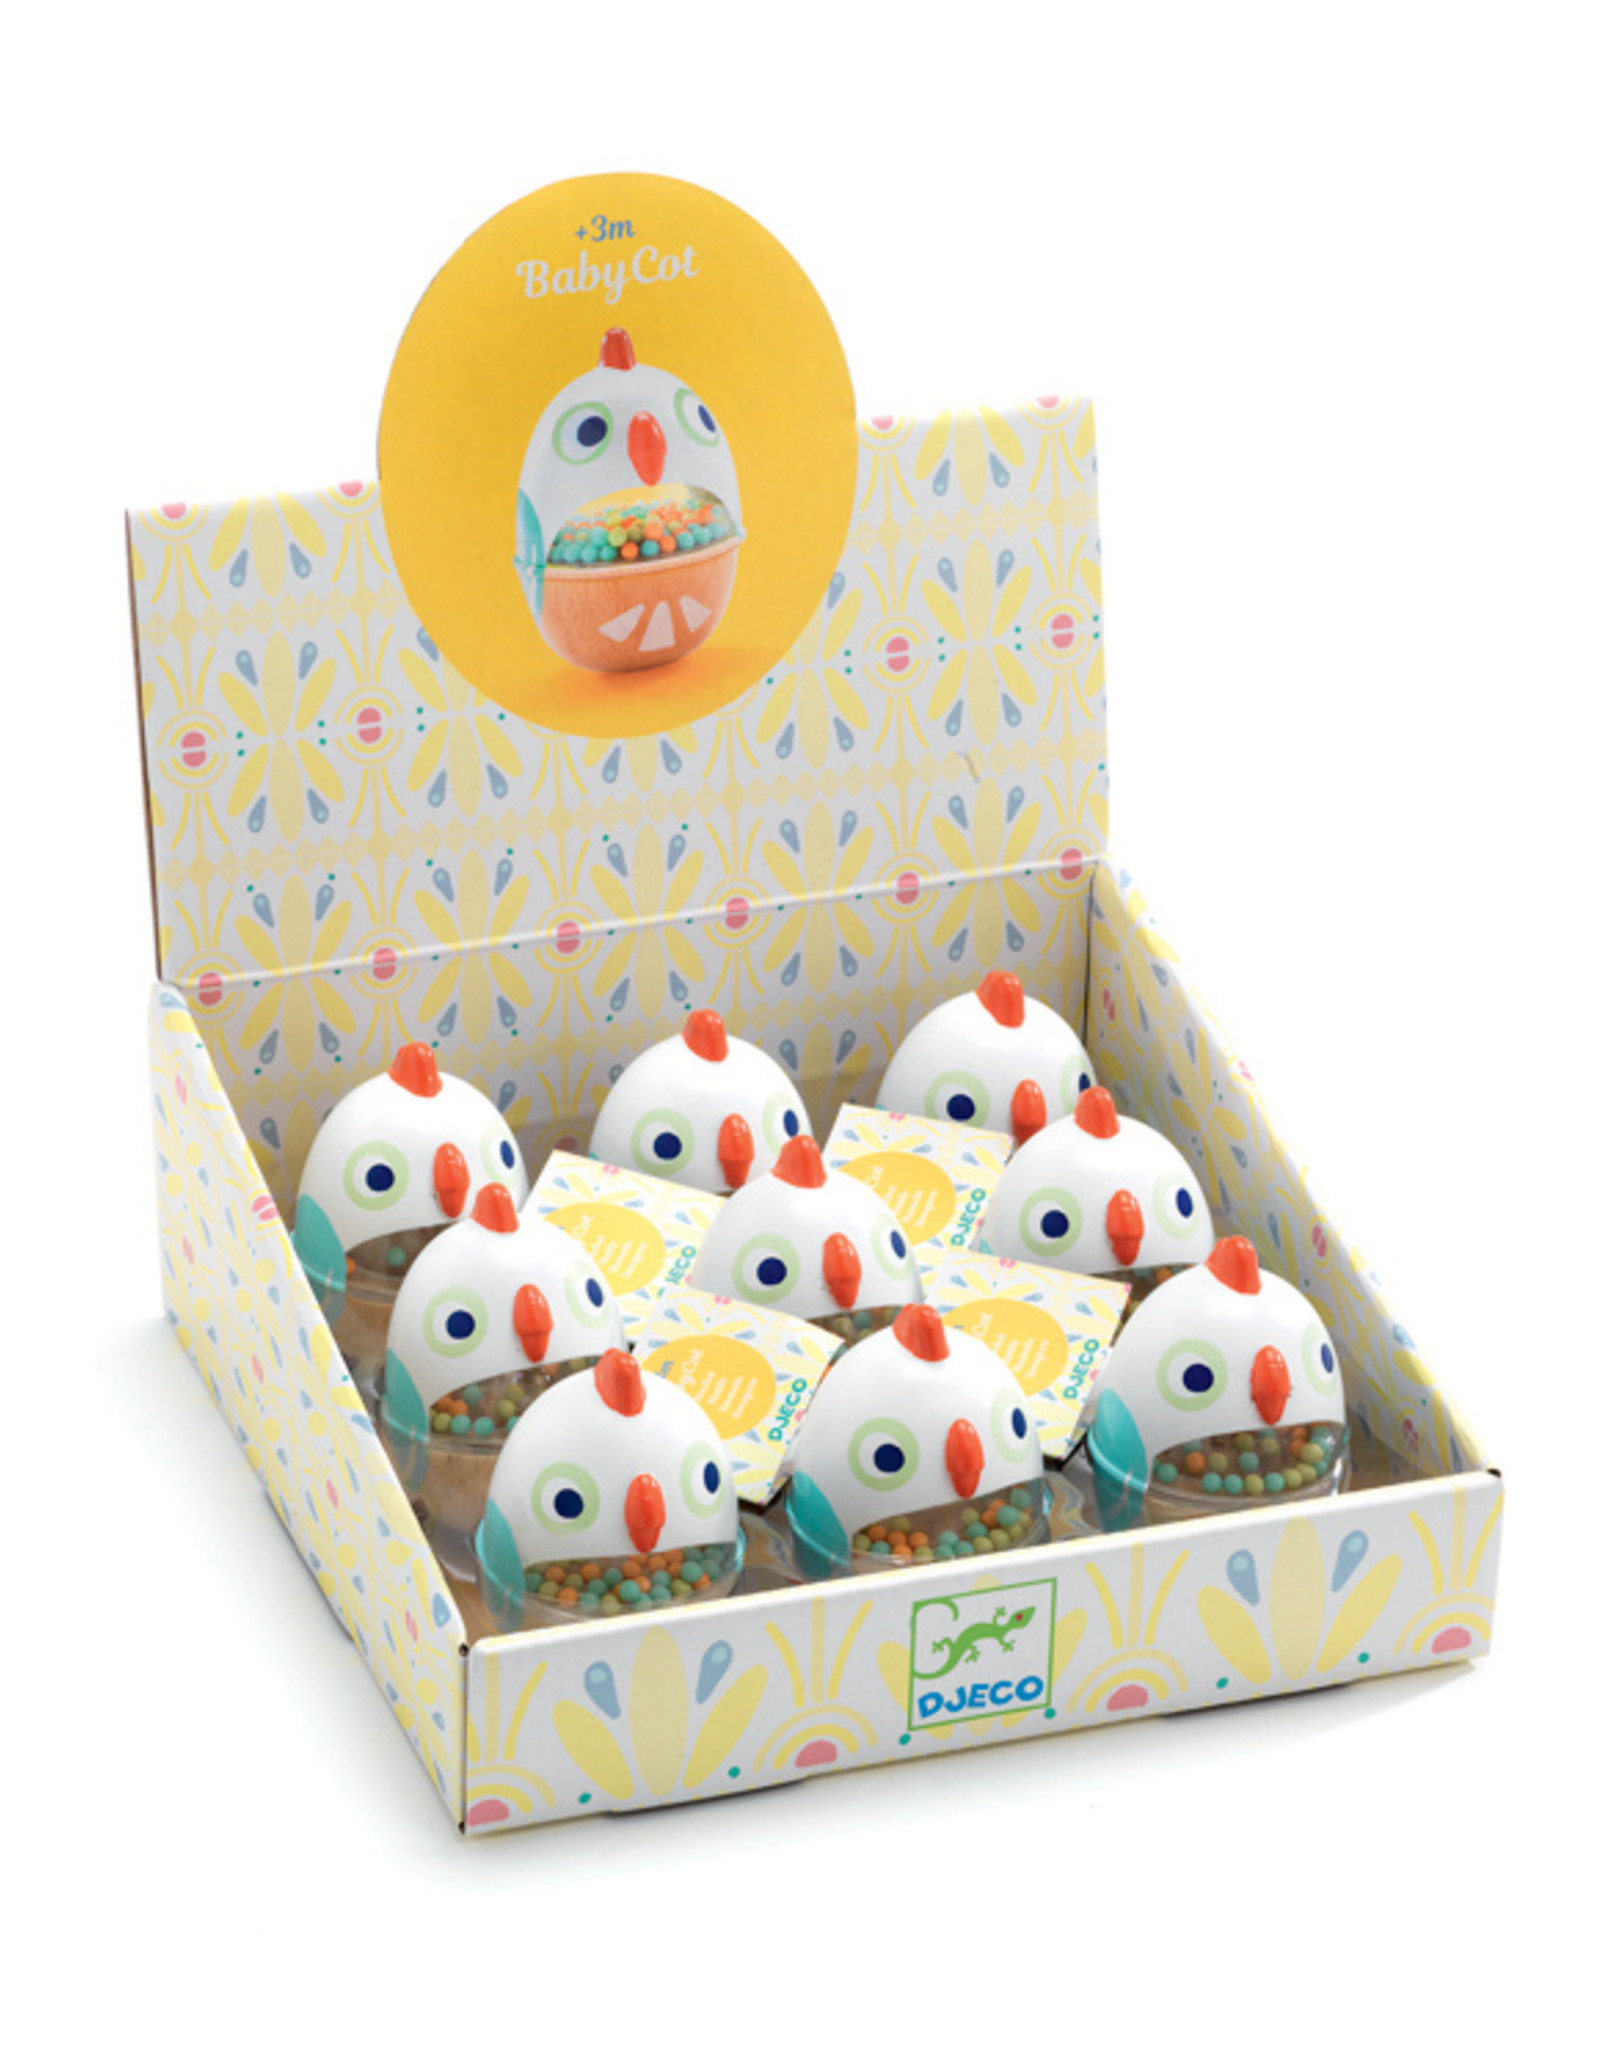 Djeco Djeco - Babycot Egg  Shaker